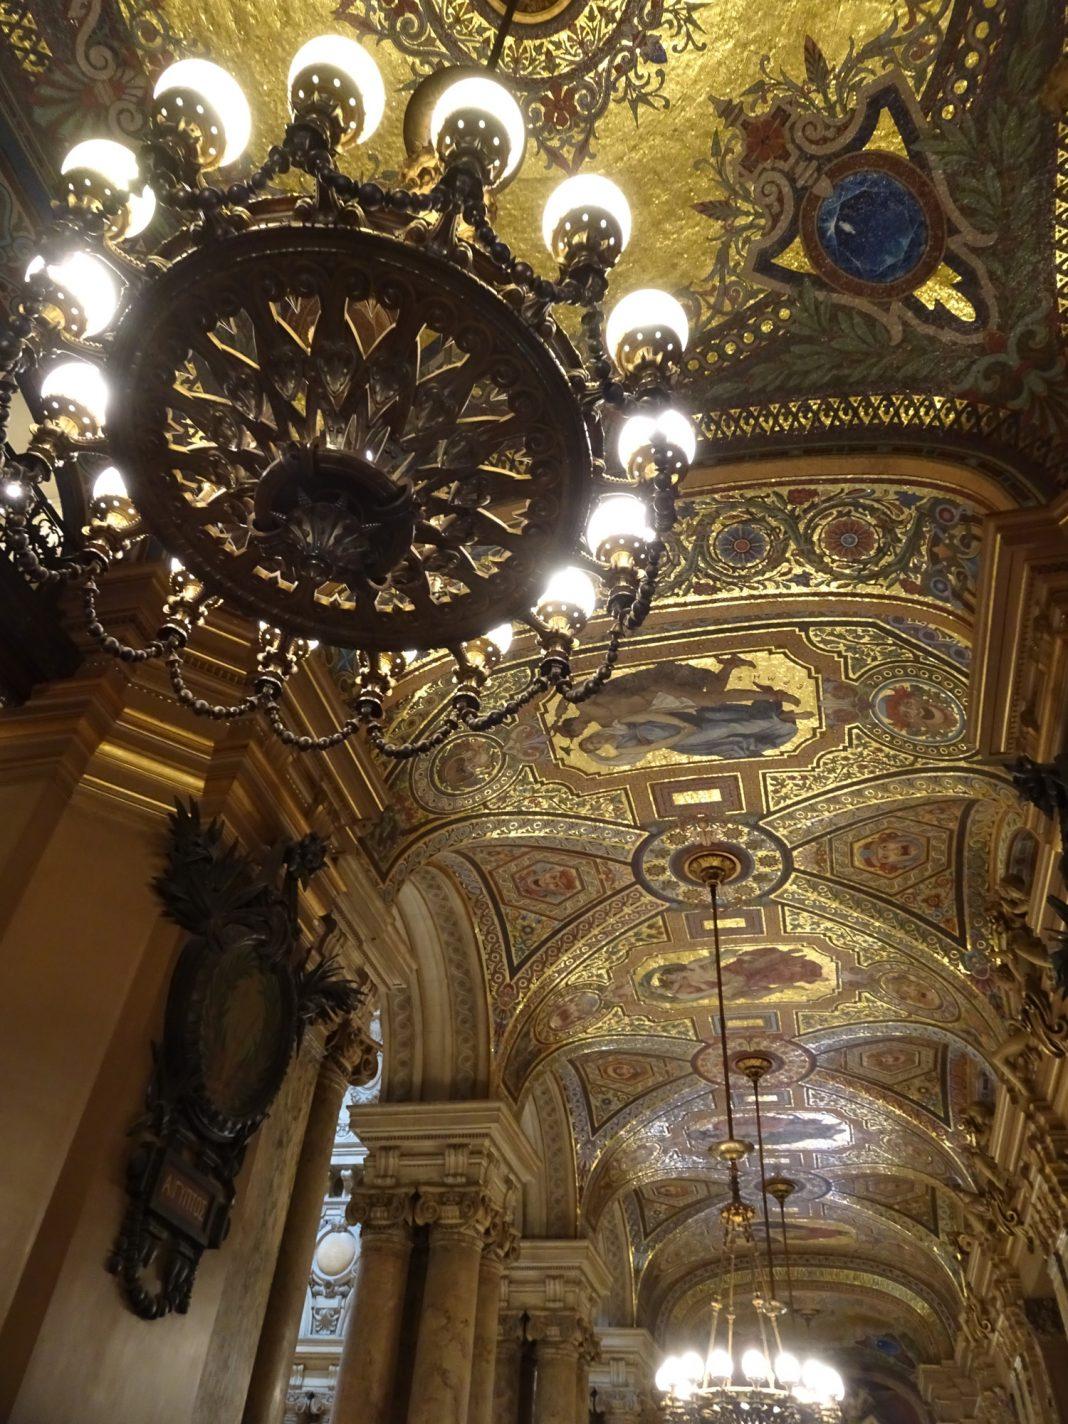 Mooi gedecoreerd plafond in Palais Garnier - Parijs na de lockdown